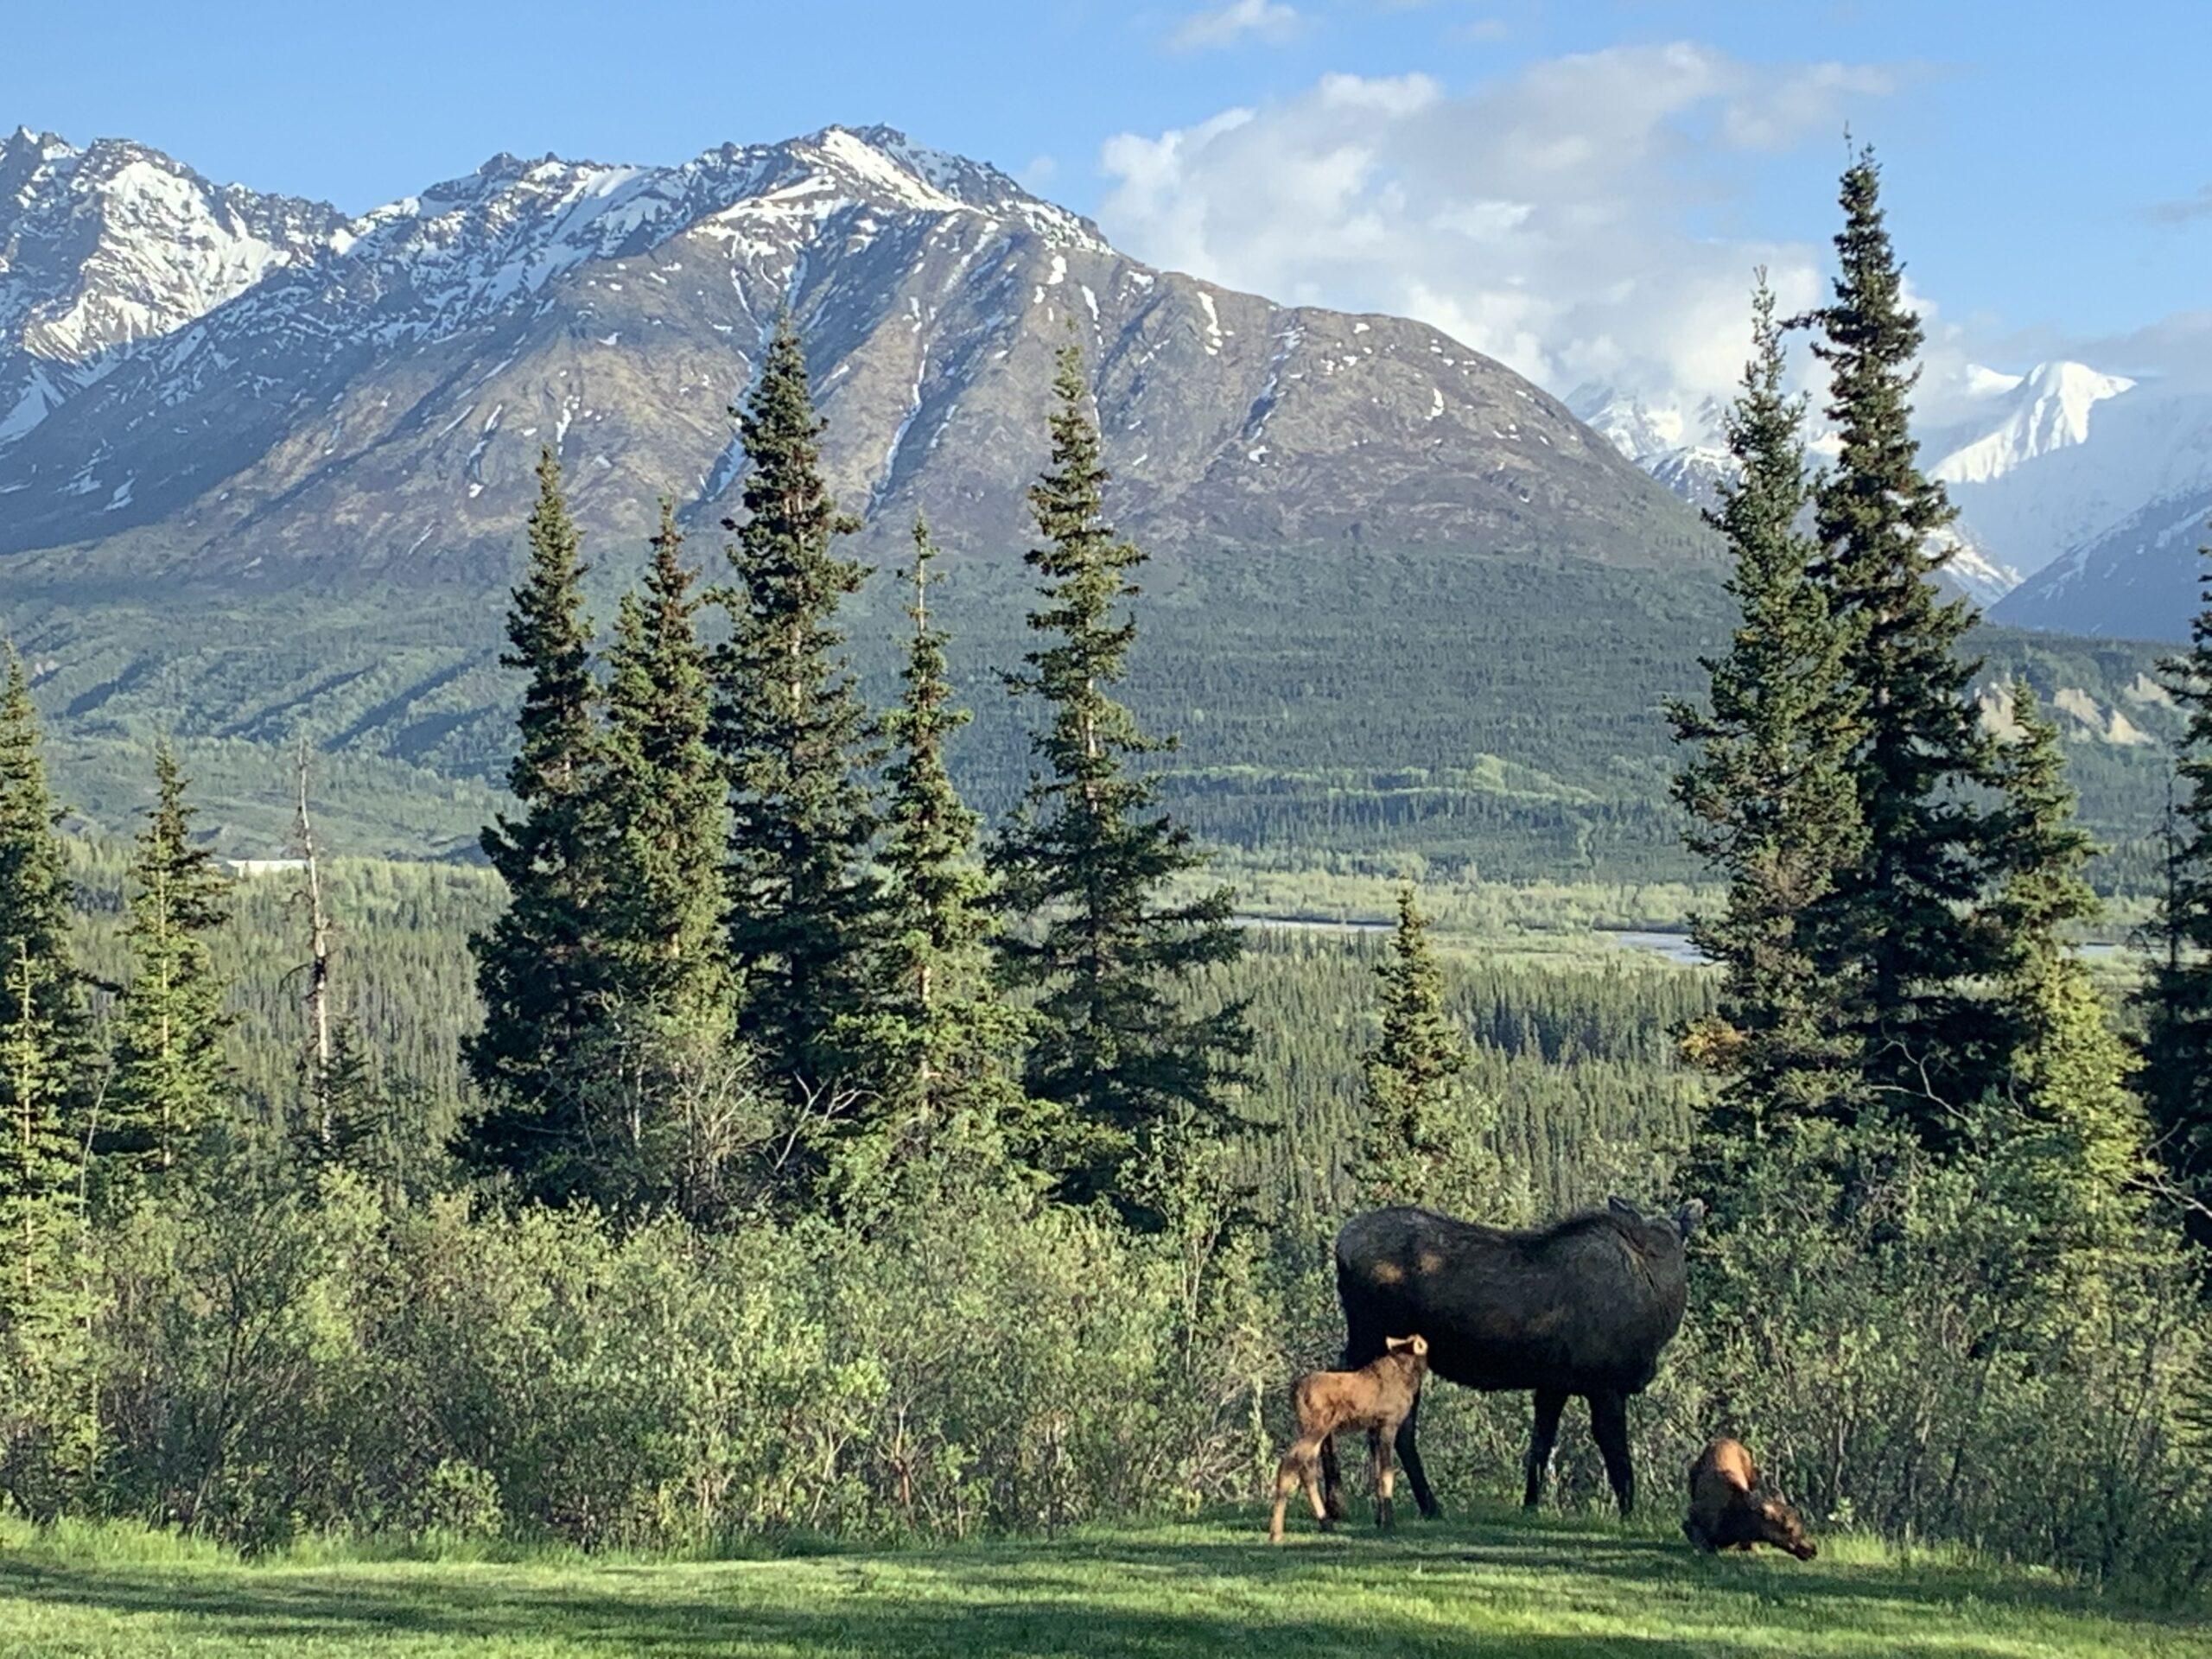 Alaska Wildlife in the mountains